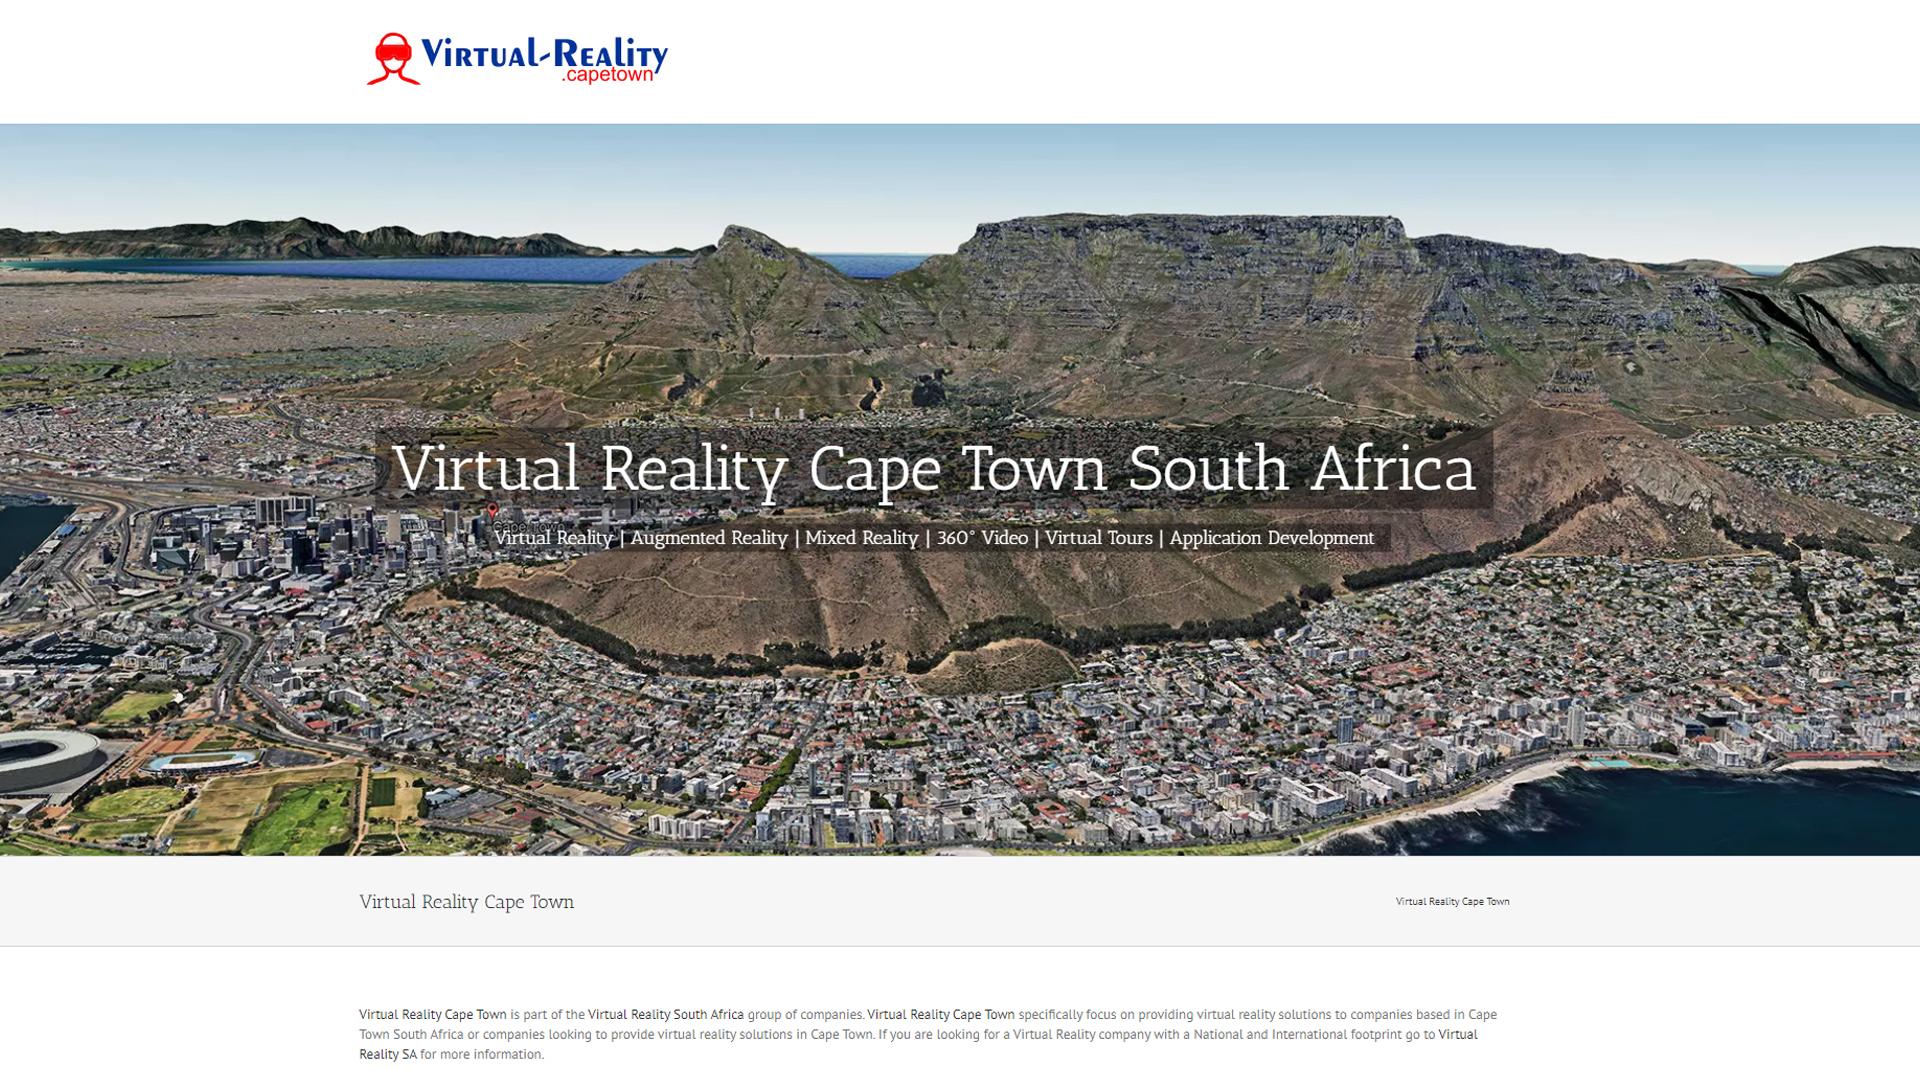 virtual reality cape town